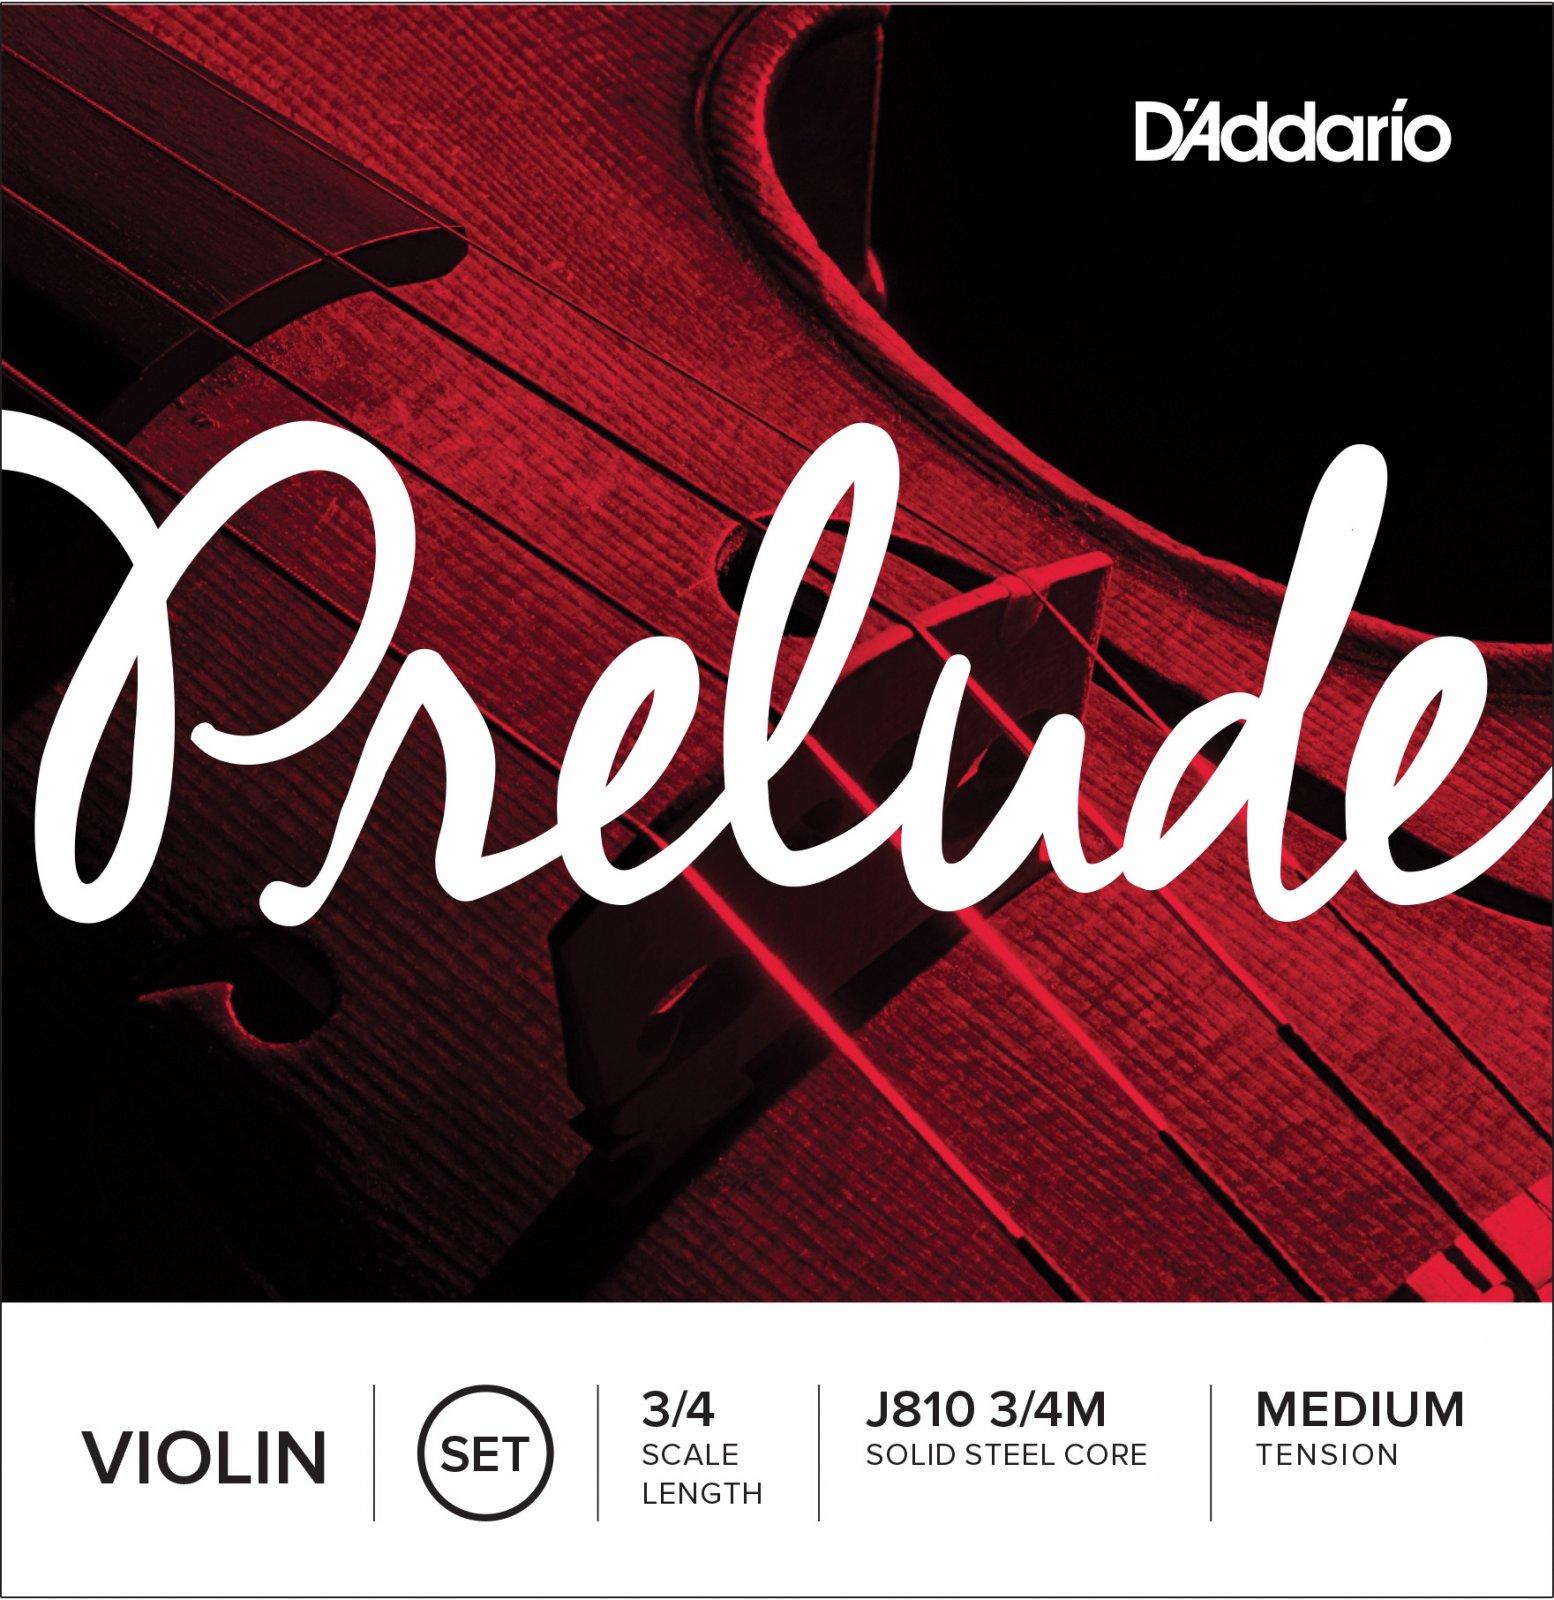 D'Addario Prelude Violin String Set 3/4 (J810)